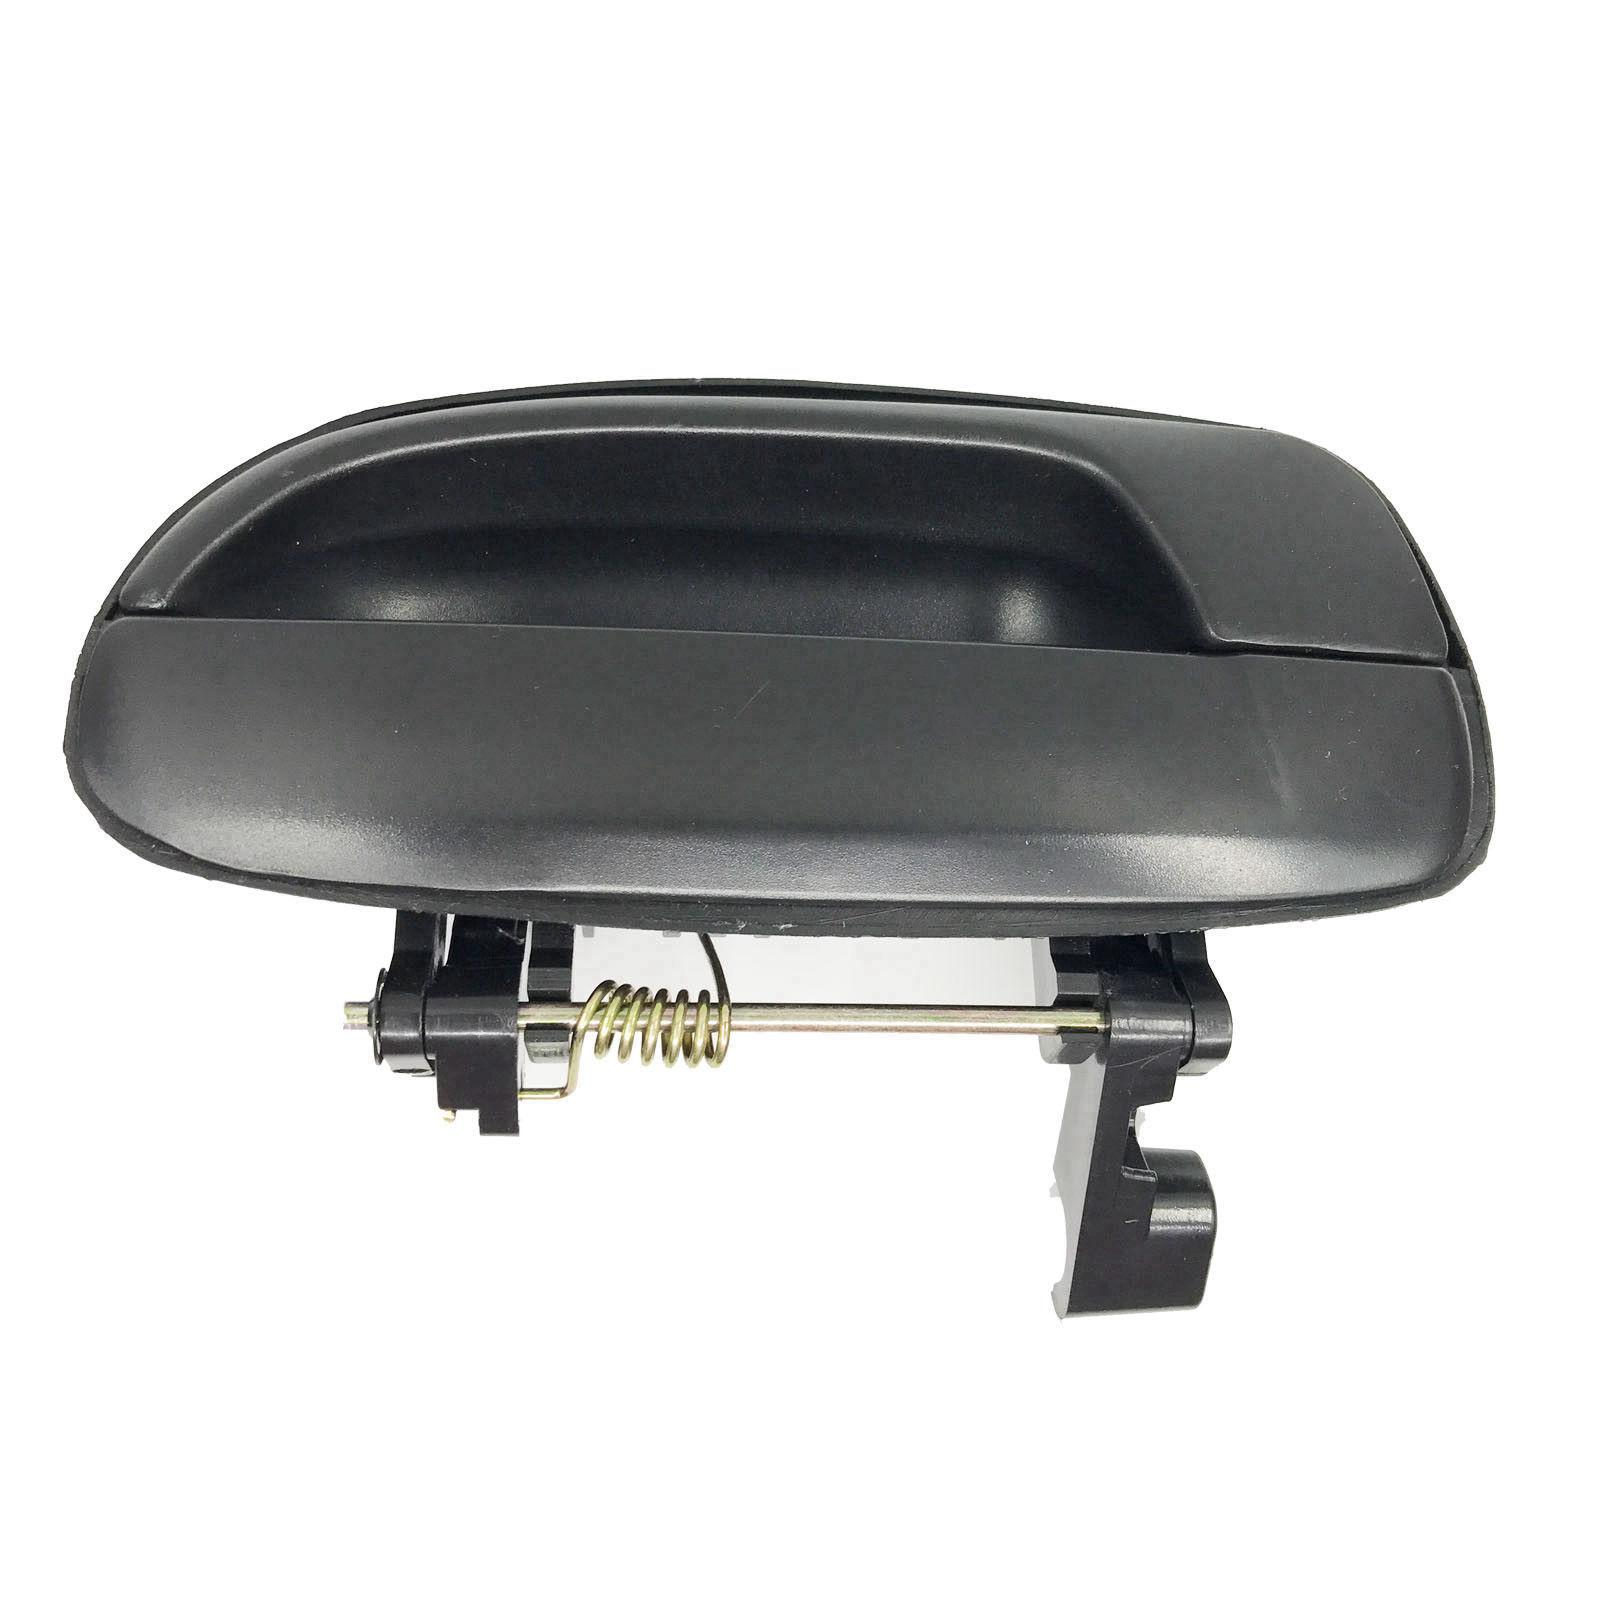 For hyundai accent 00 06 outside exterior door handle rear right 83660 25000 new discount auto Hyundai accent exterior door handle